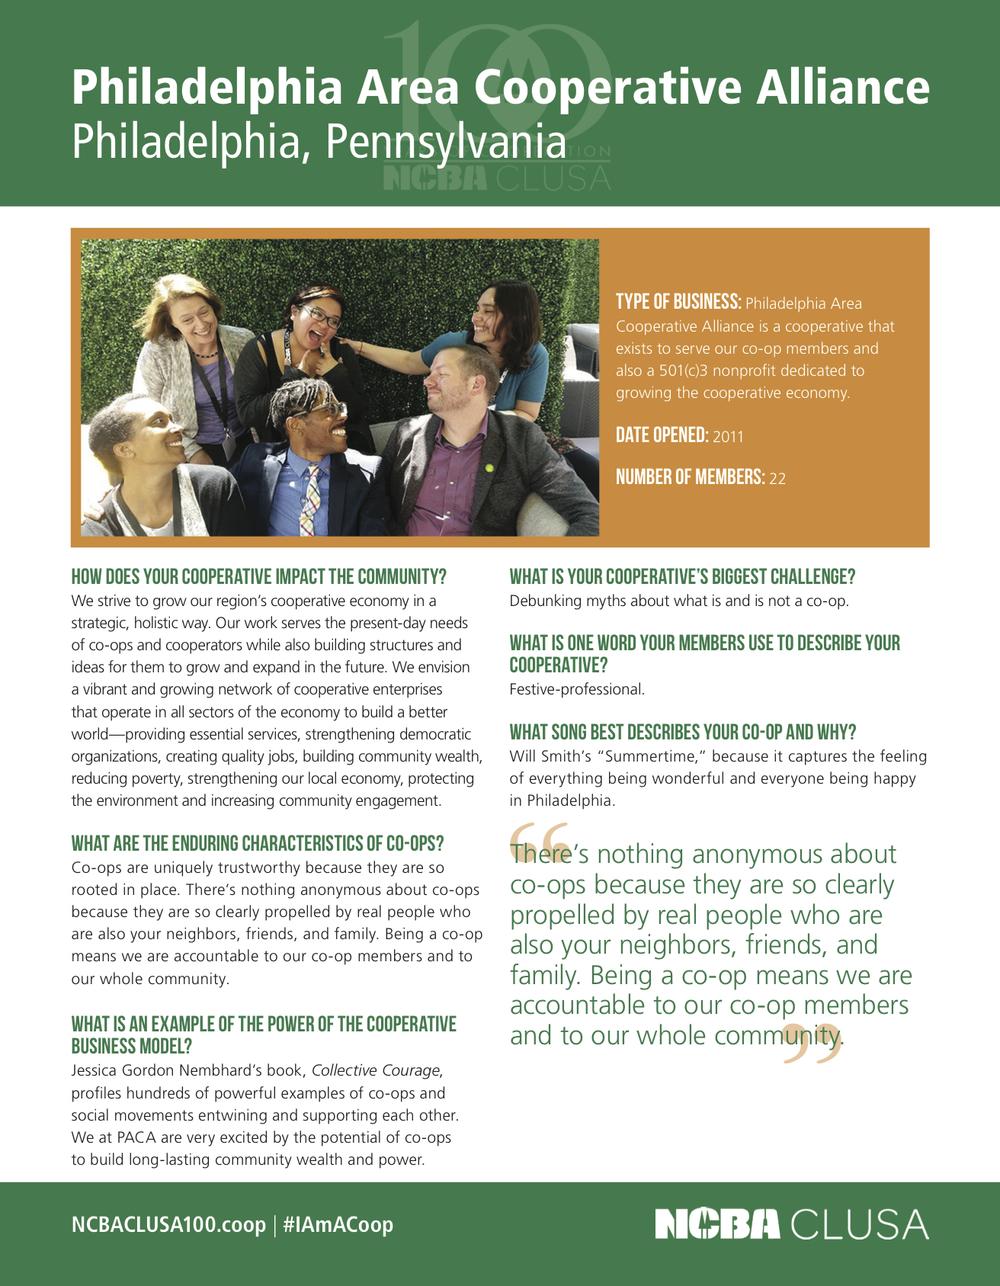 PACA_Philadelphia copy.jpg